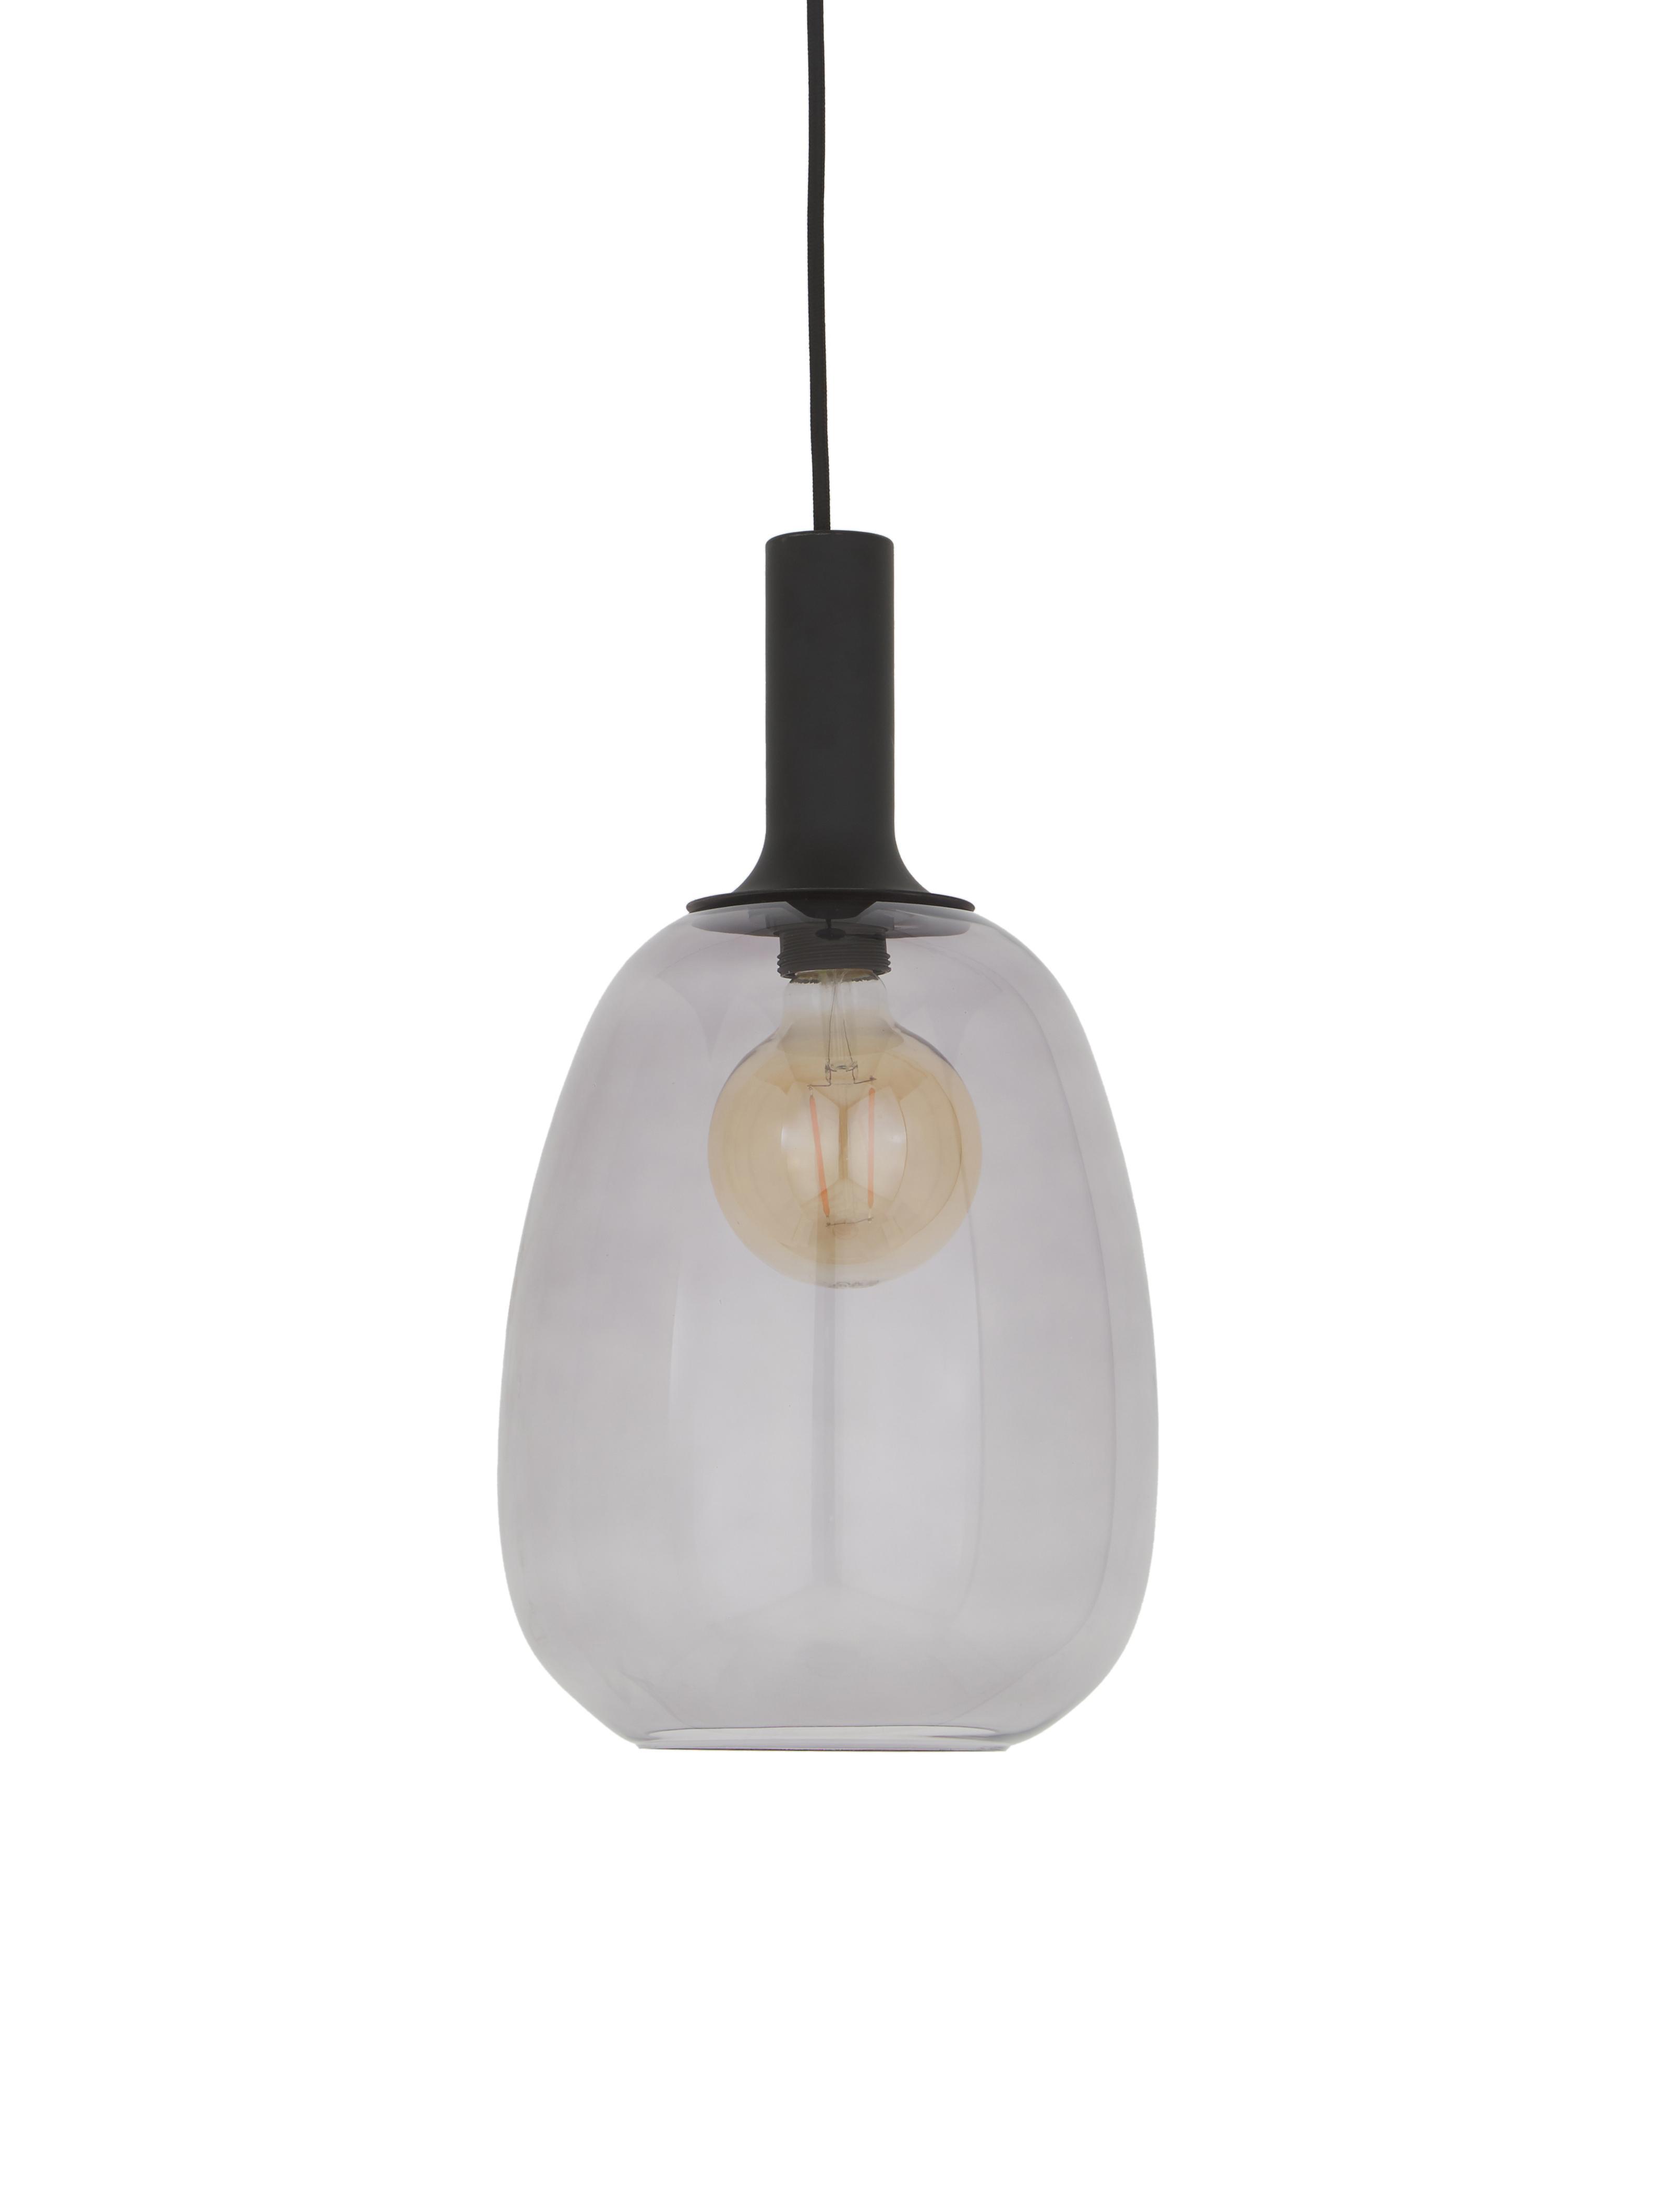 Hanglamp Alton, Lampenkap: glas, Zwart, grijs, transparant, Ø 23 x H 43 cm